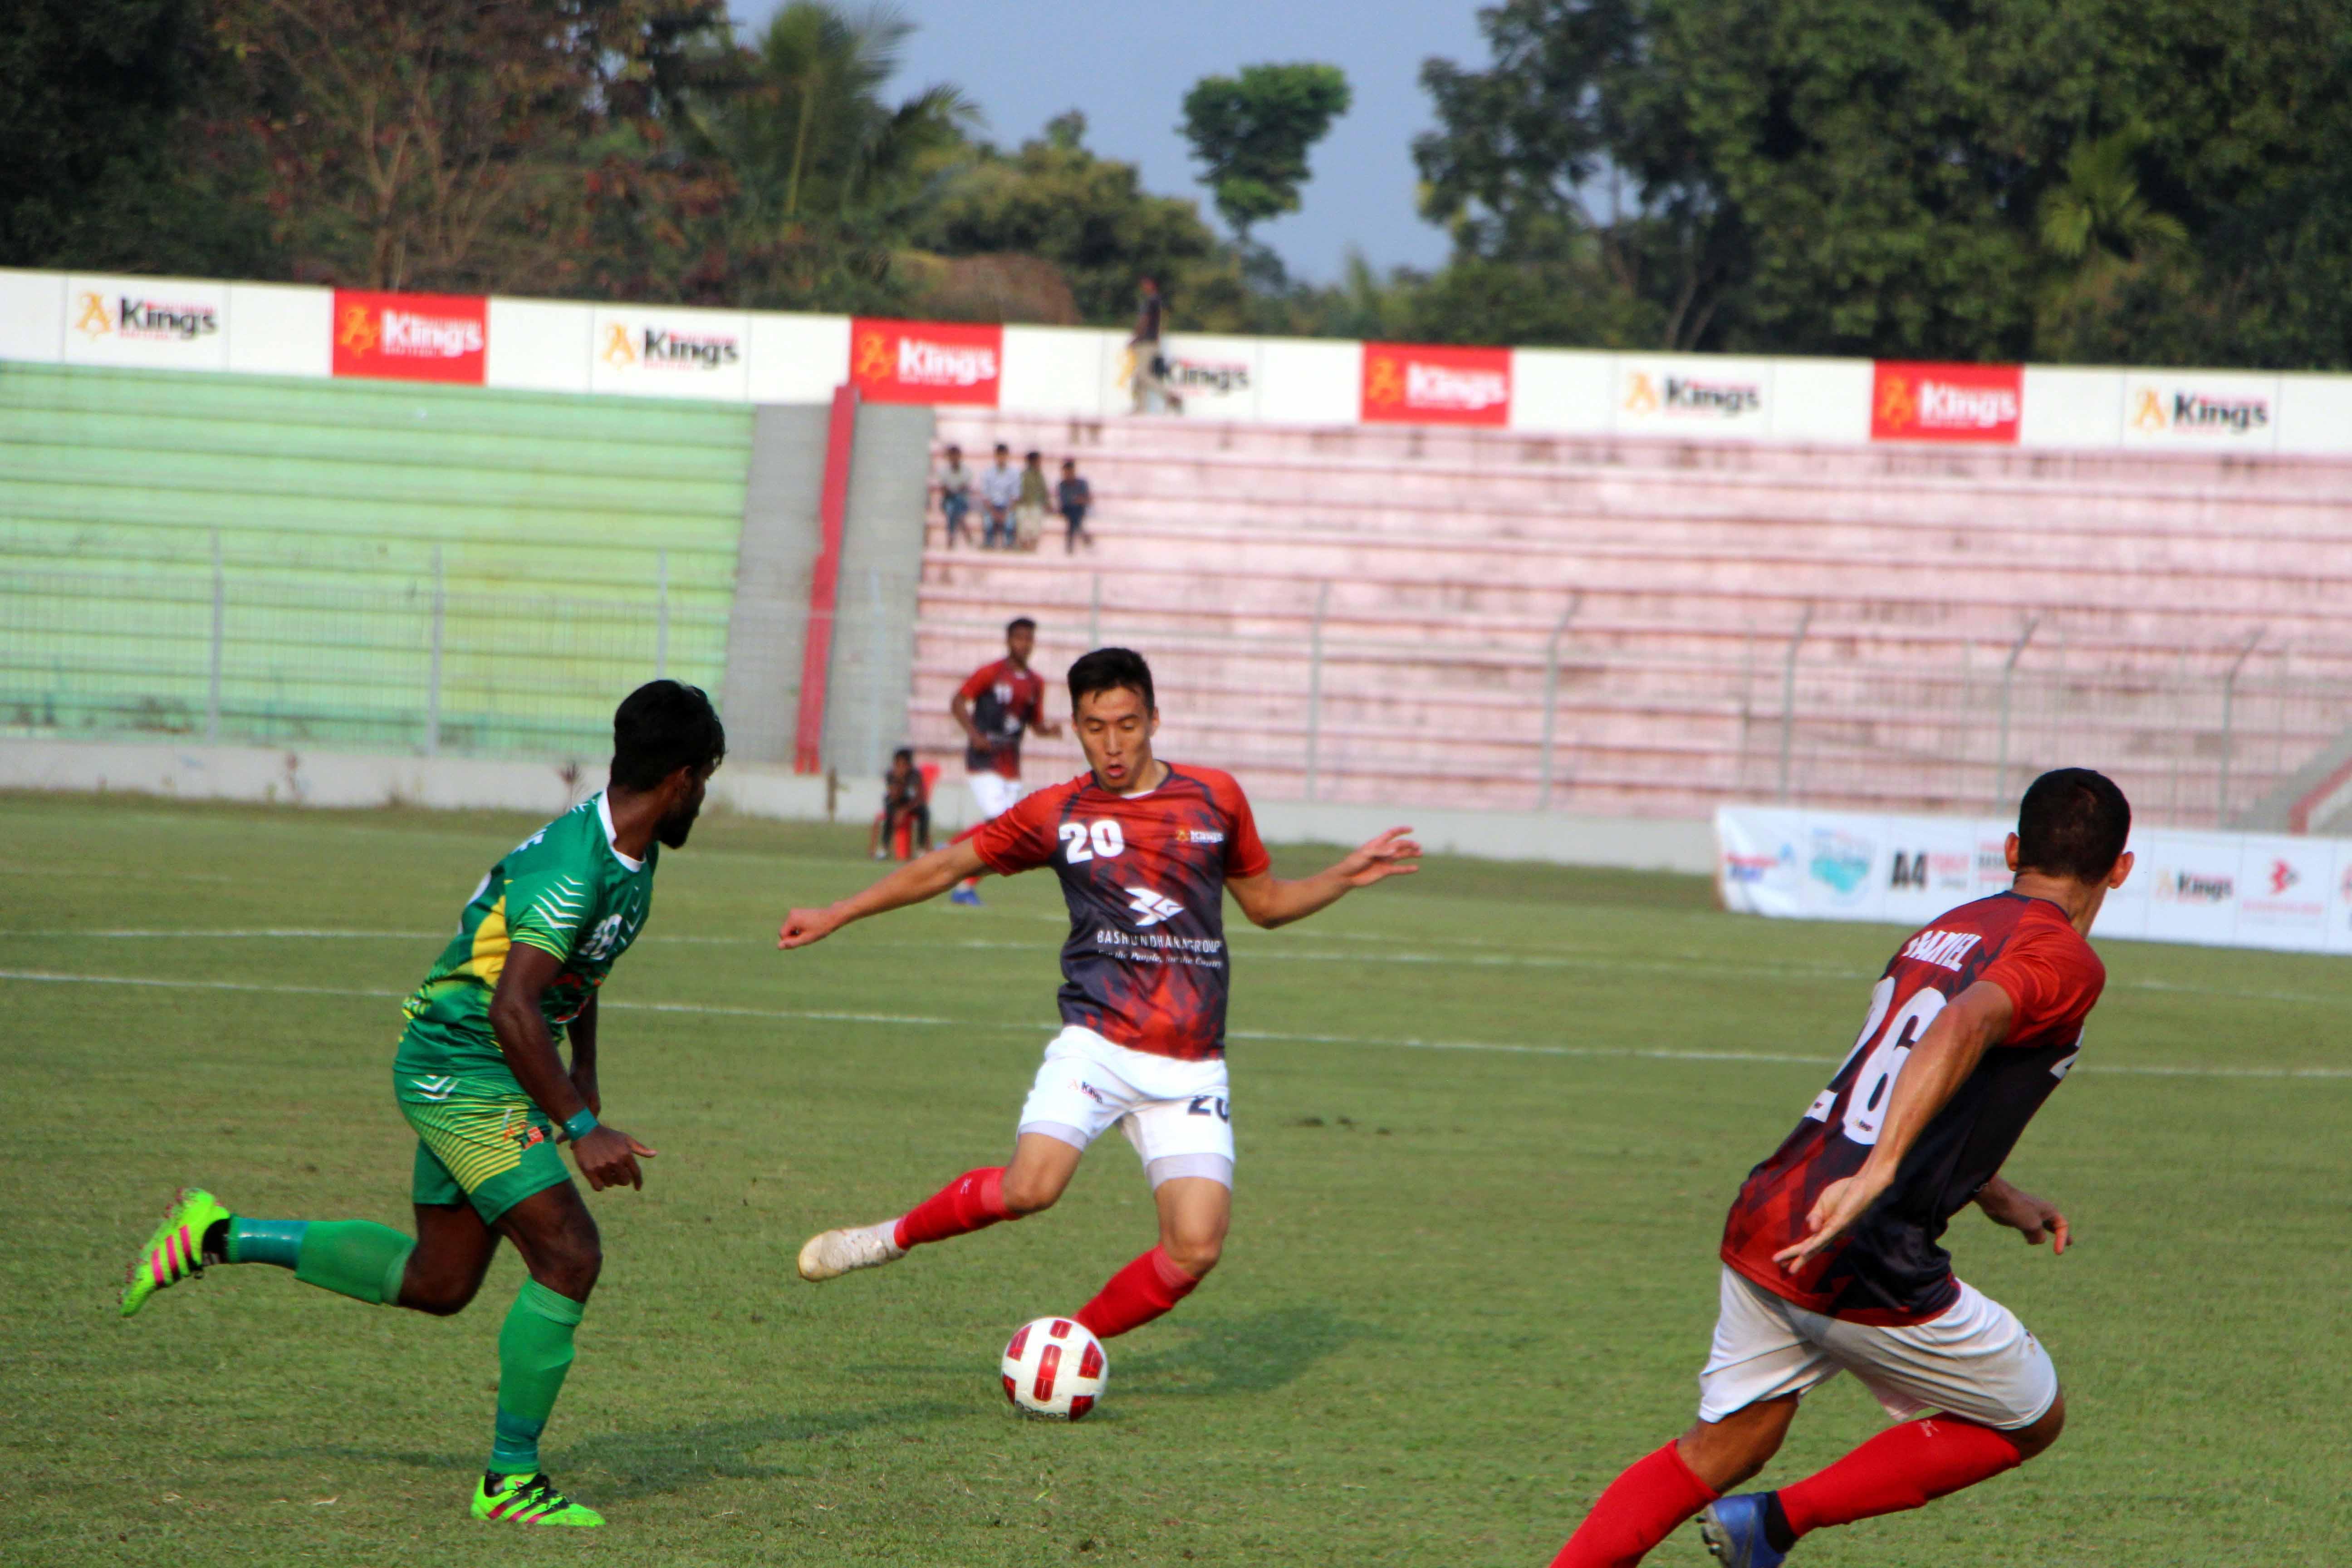 A view of the football match of the Bangladesh Premier League between Bashundhara Kings and Rahmatganj MFS at Sheikh Kamal Stadium in Nilphamari on Thursday. Bashundhara Kings won the match 1-0.